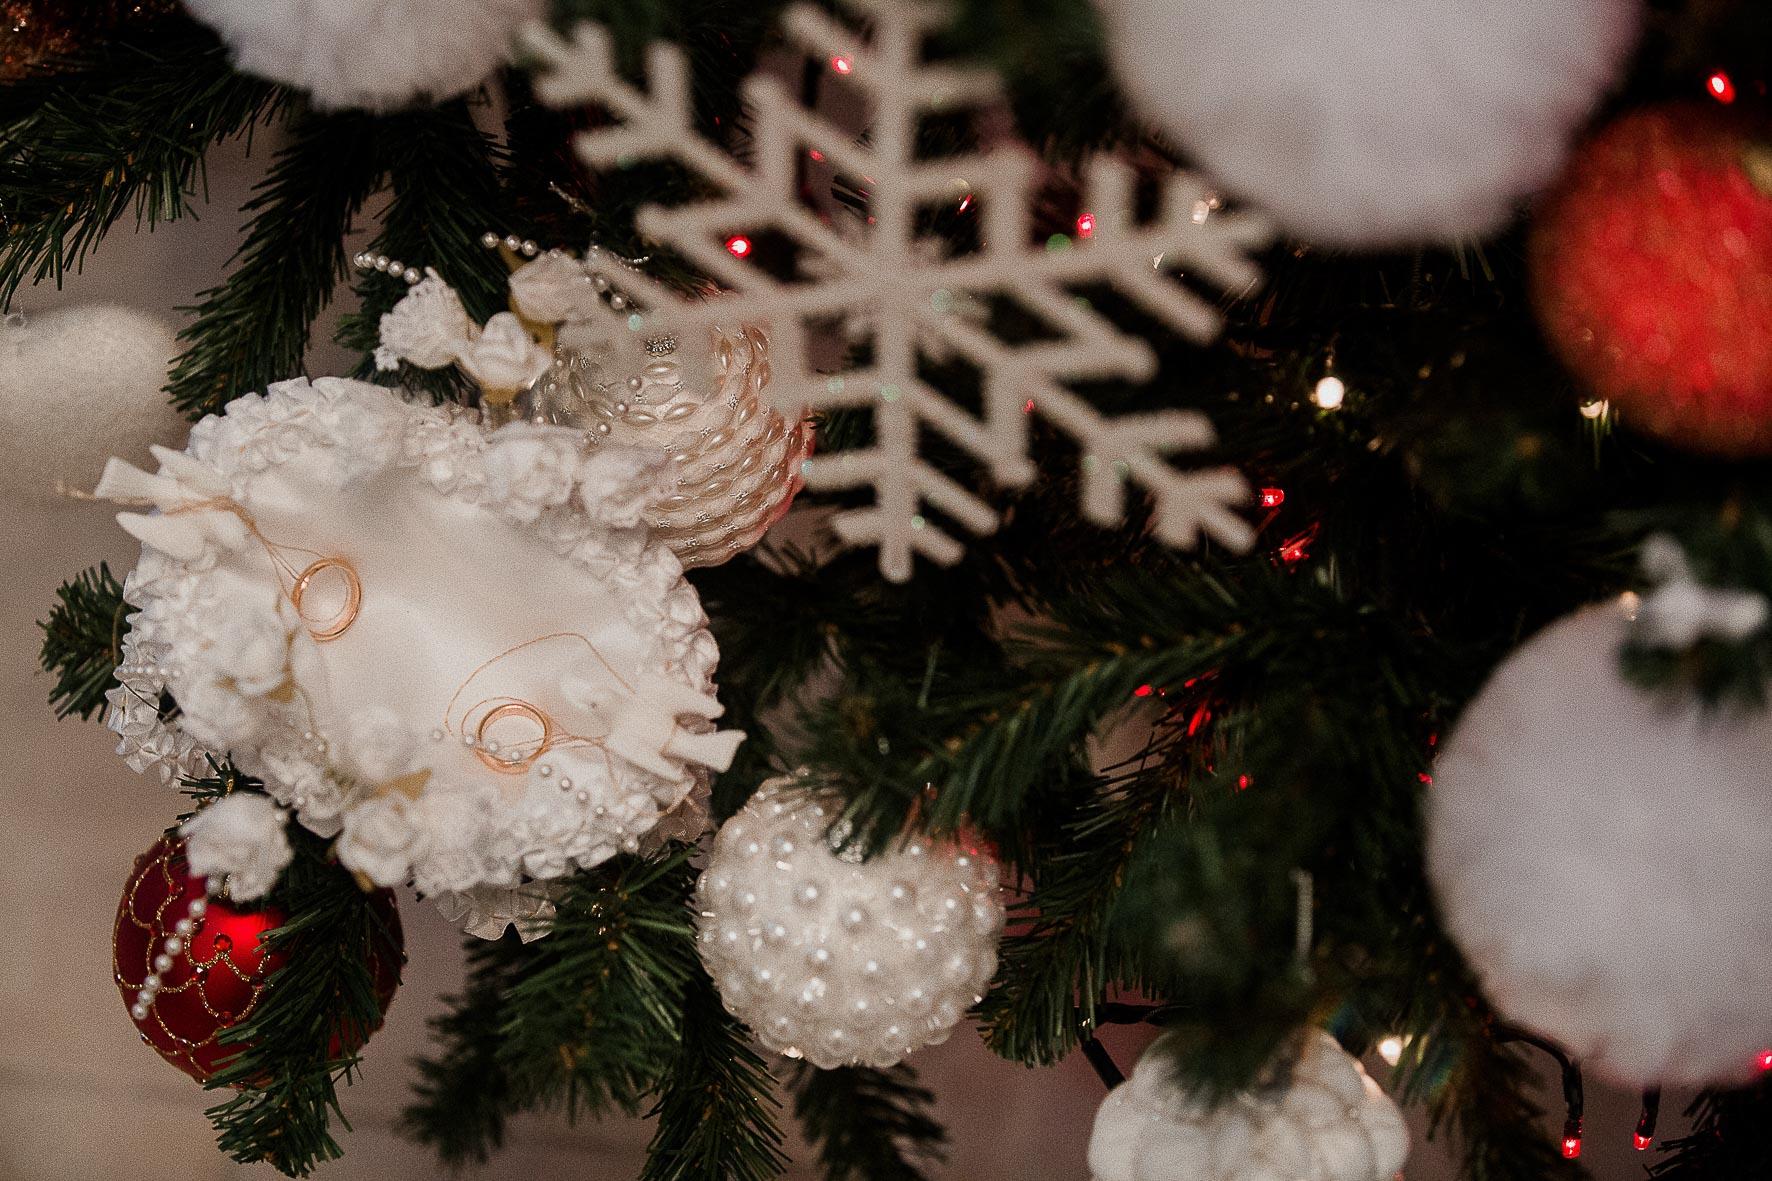 dettagli-matrimonio-natalizio